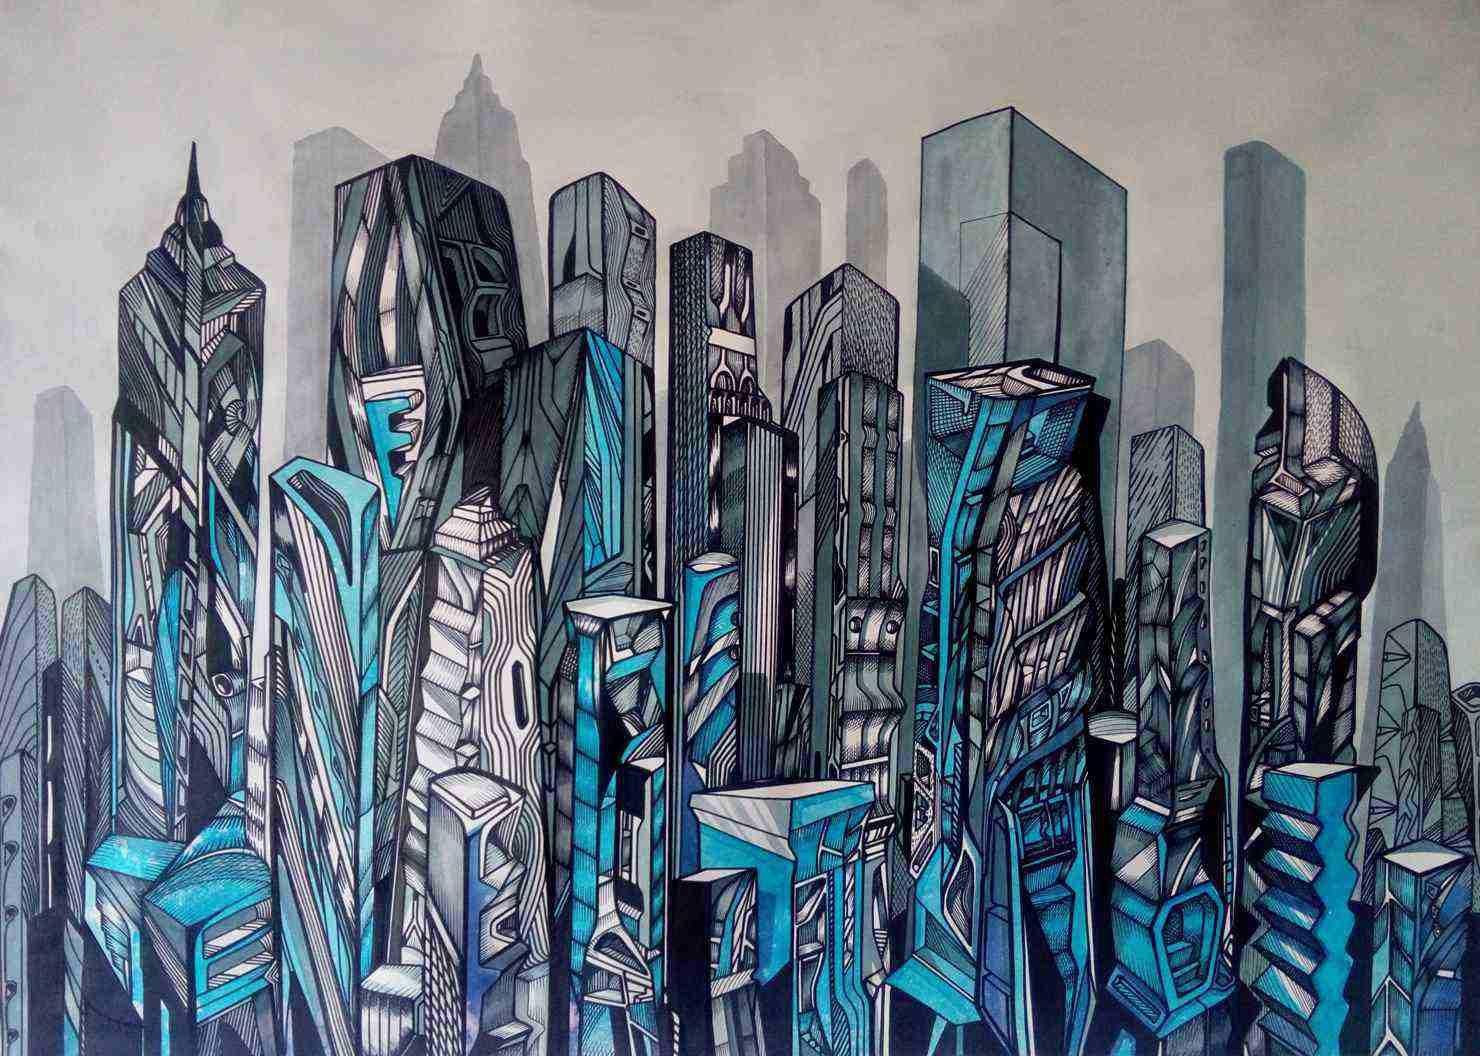 Urban city series by Marko Gavrilovic